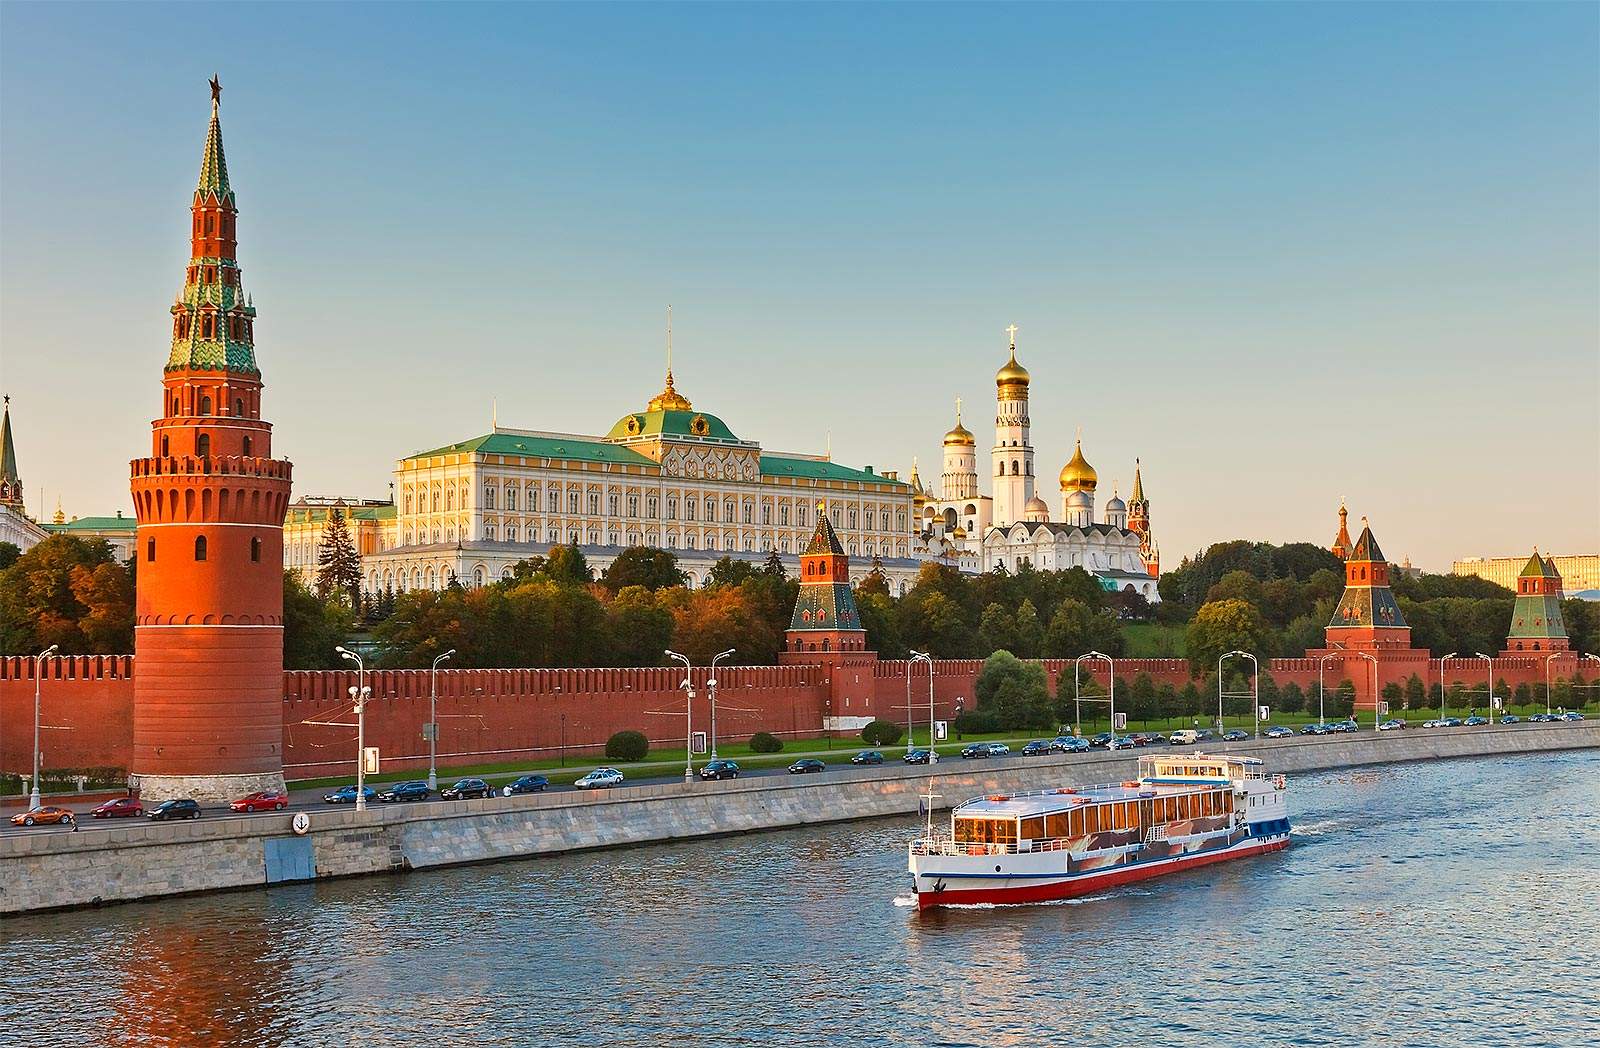 Москва заработала 600 млрд рублей на туристах